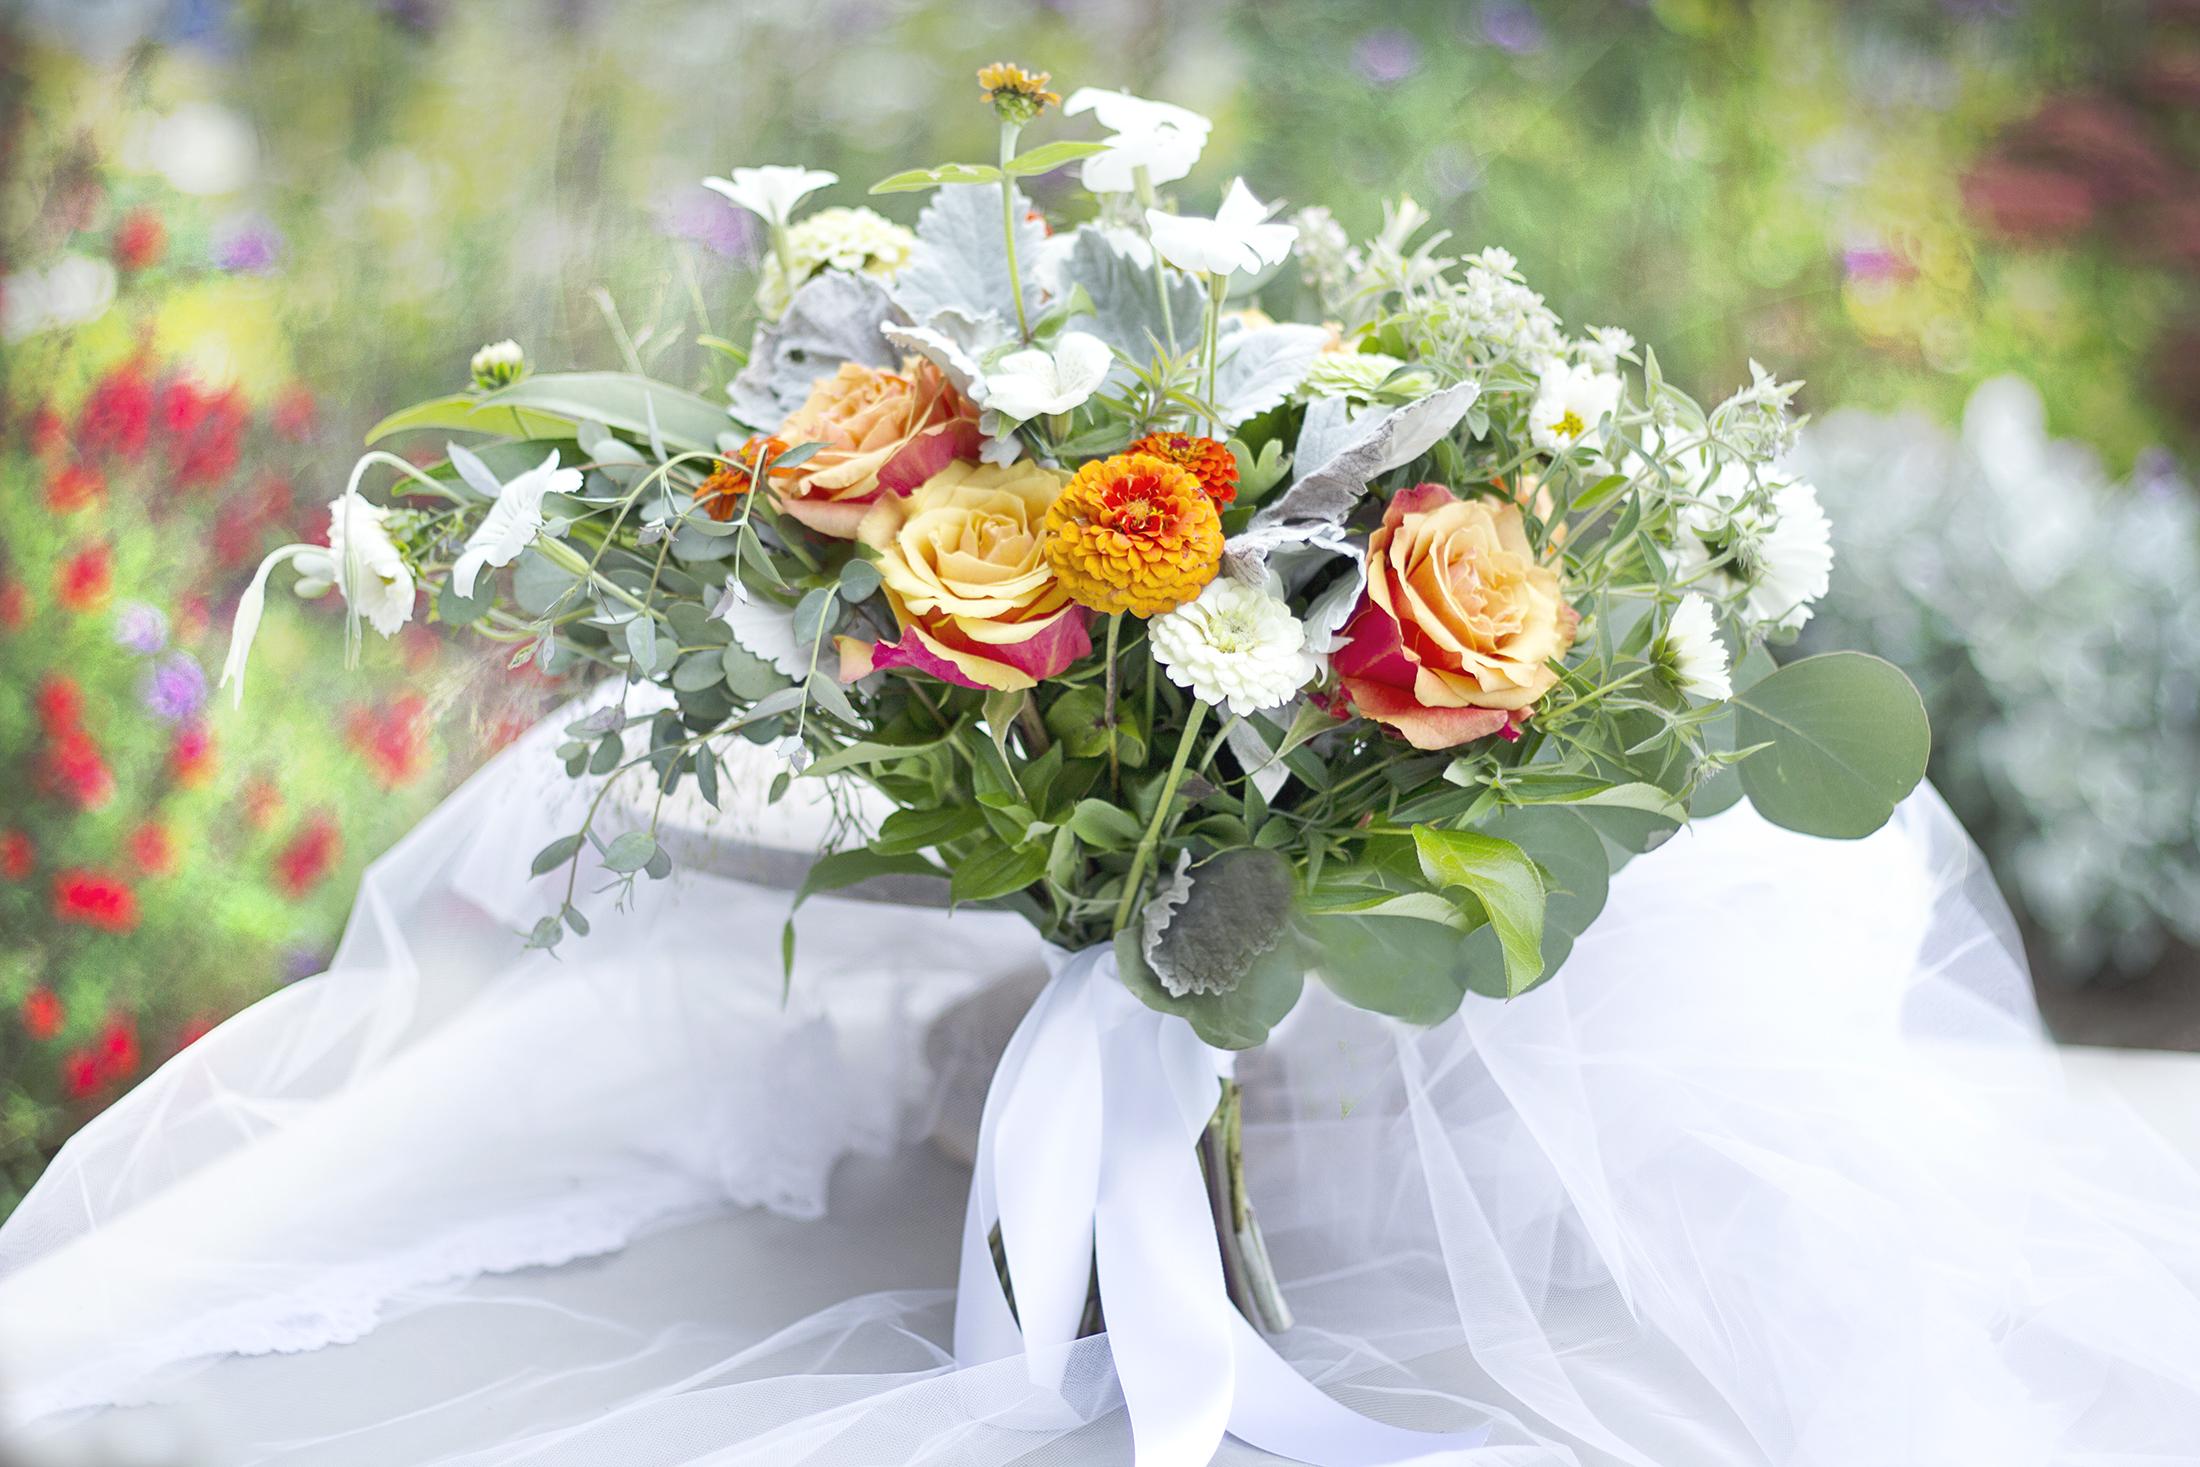 reduced_ss_bridal_bouquet_orange_white_silver.jpg